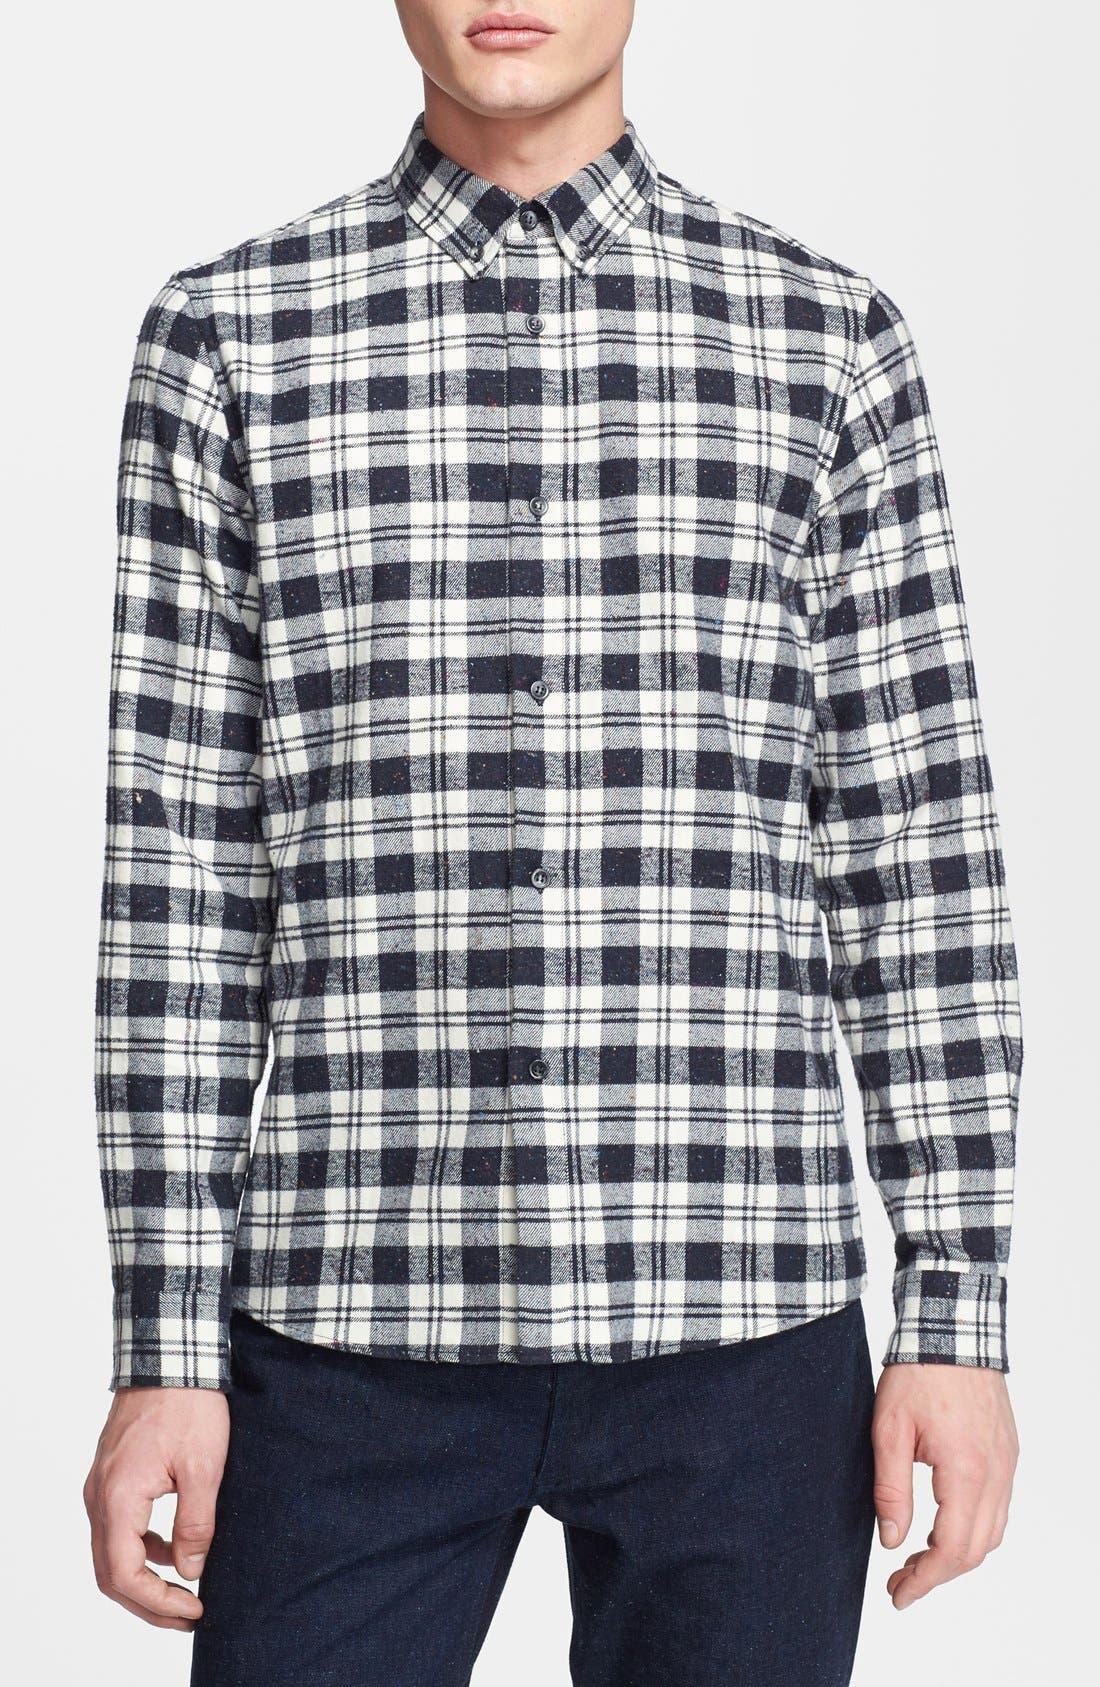 Alternate Image 1 Selected - A.P.C. Plaid Flannel Shirt